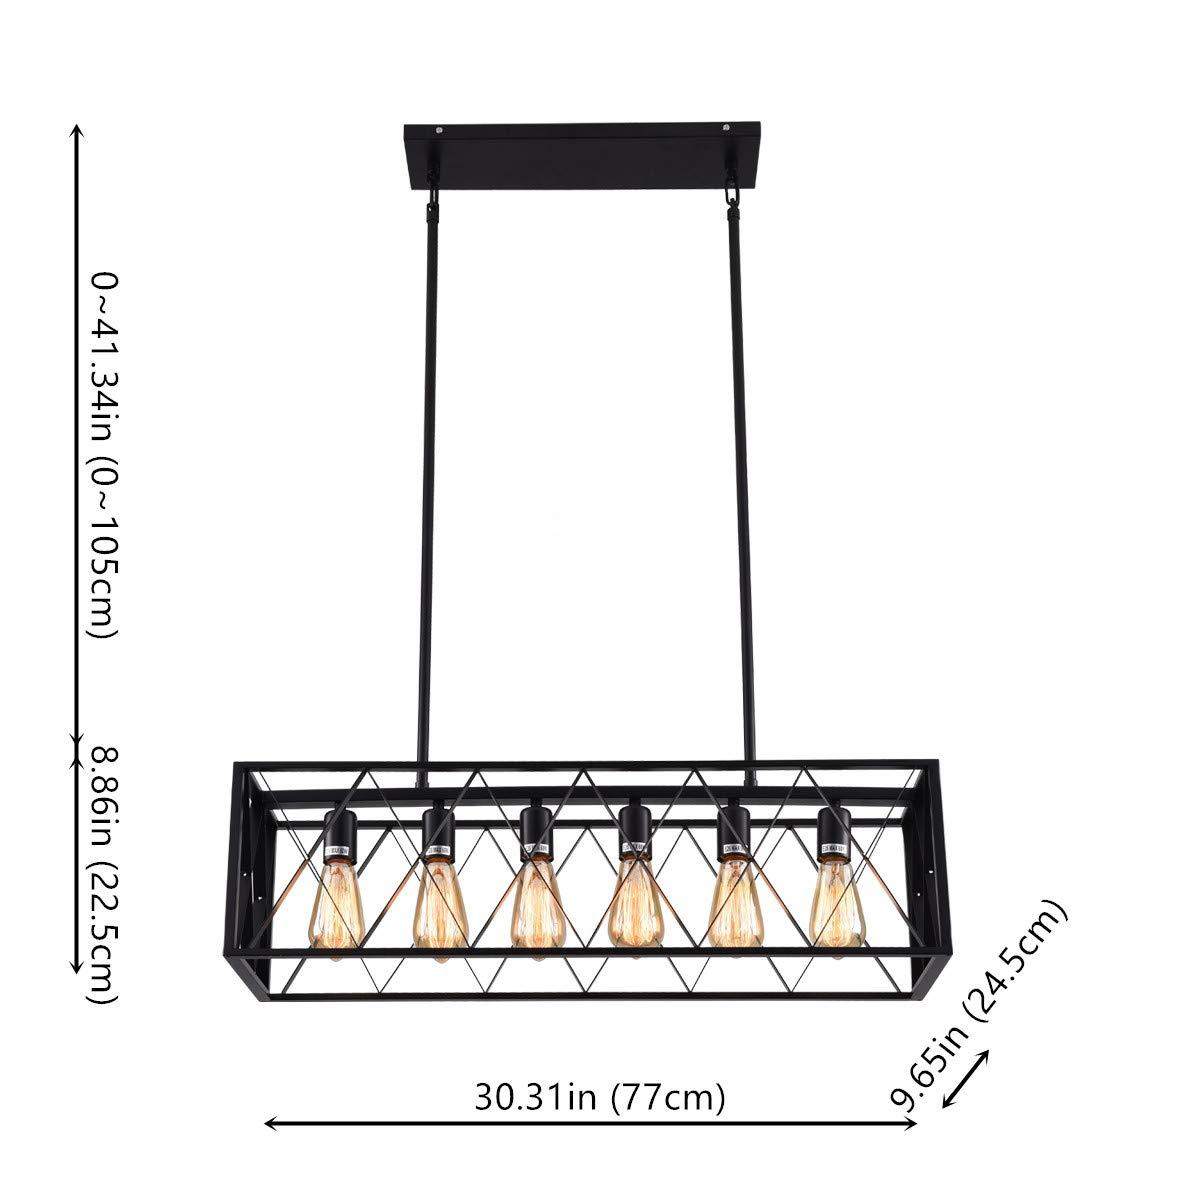 mirrea Vintage Pendant Light Fixture 6 Lights in Rectangle Frame Shade Matte Metal Black Painted Finish